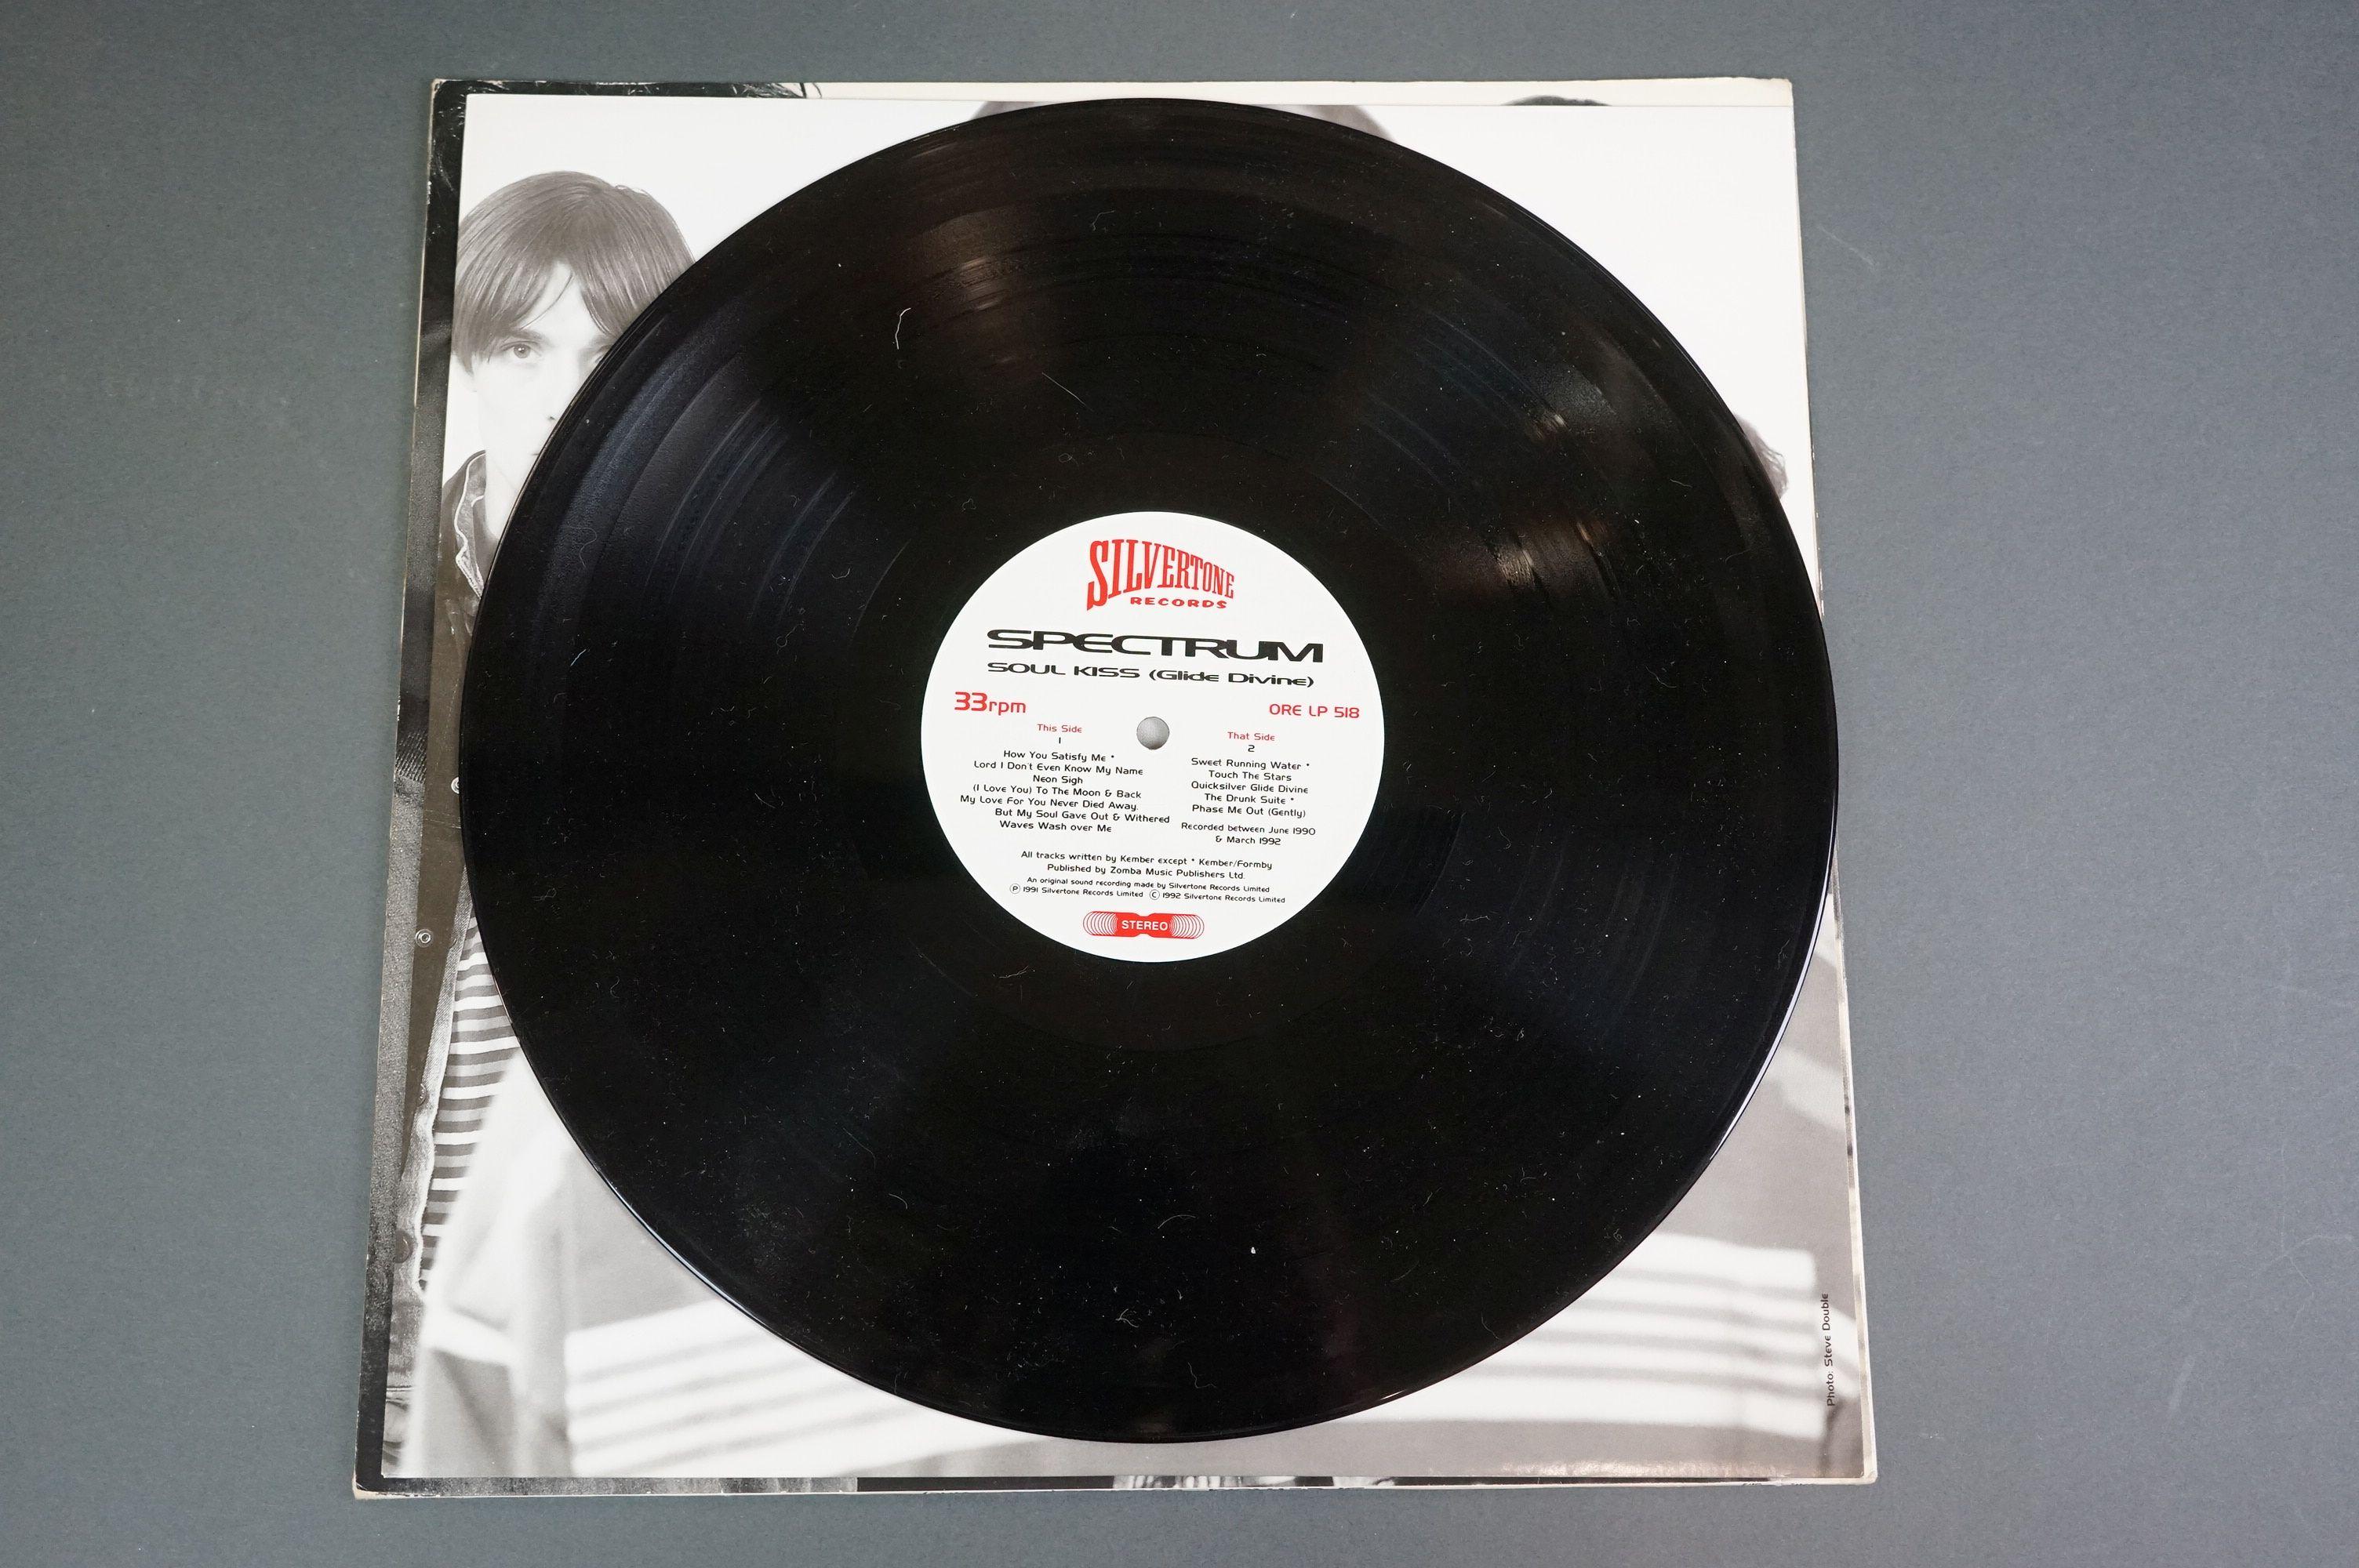 Vinyl - Spectrum Soul Kiss (Glide Devine) ORE LP 518 on Silvertone Records, original inner with - Image 5 of 6